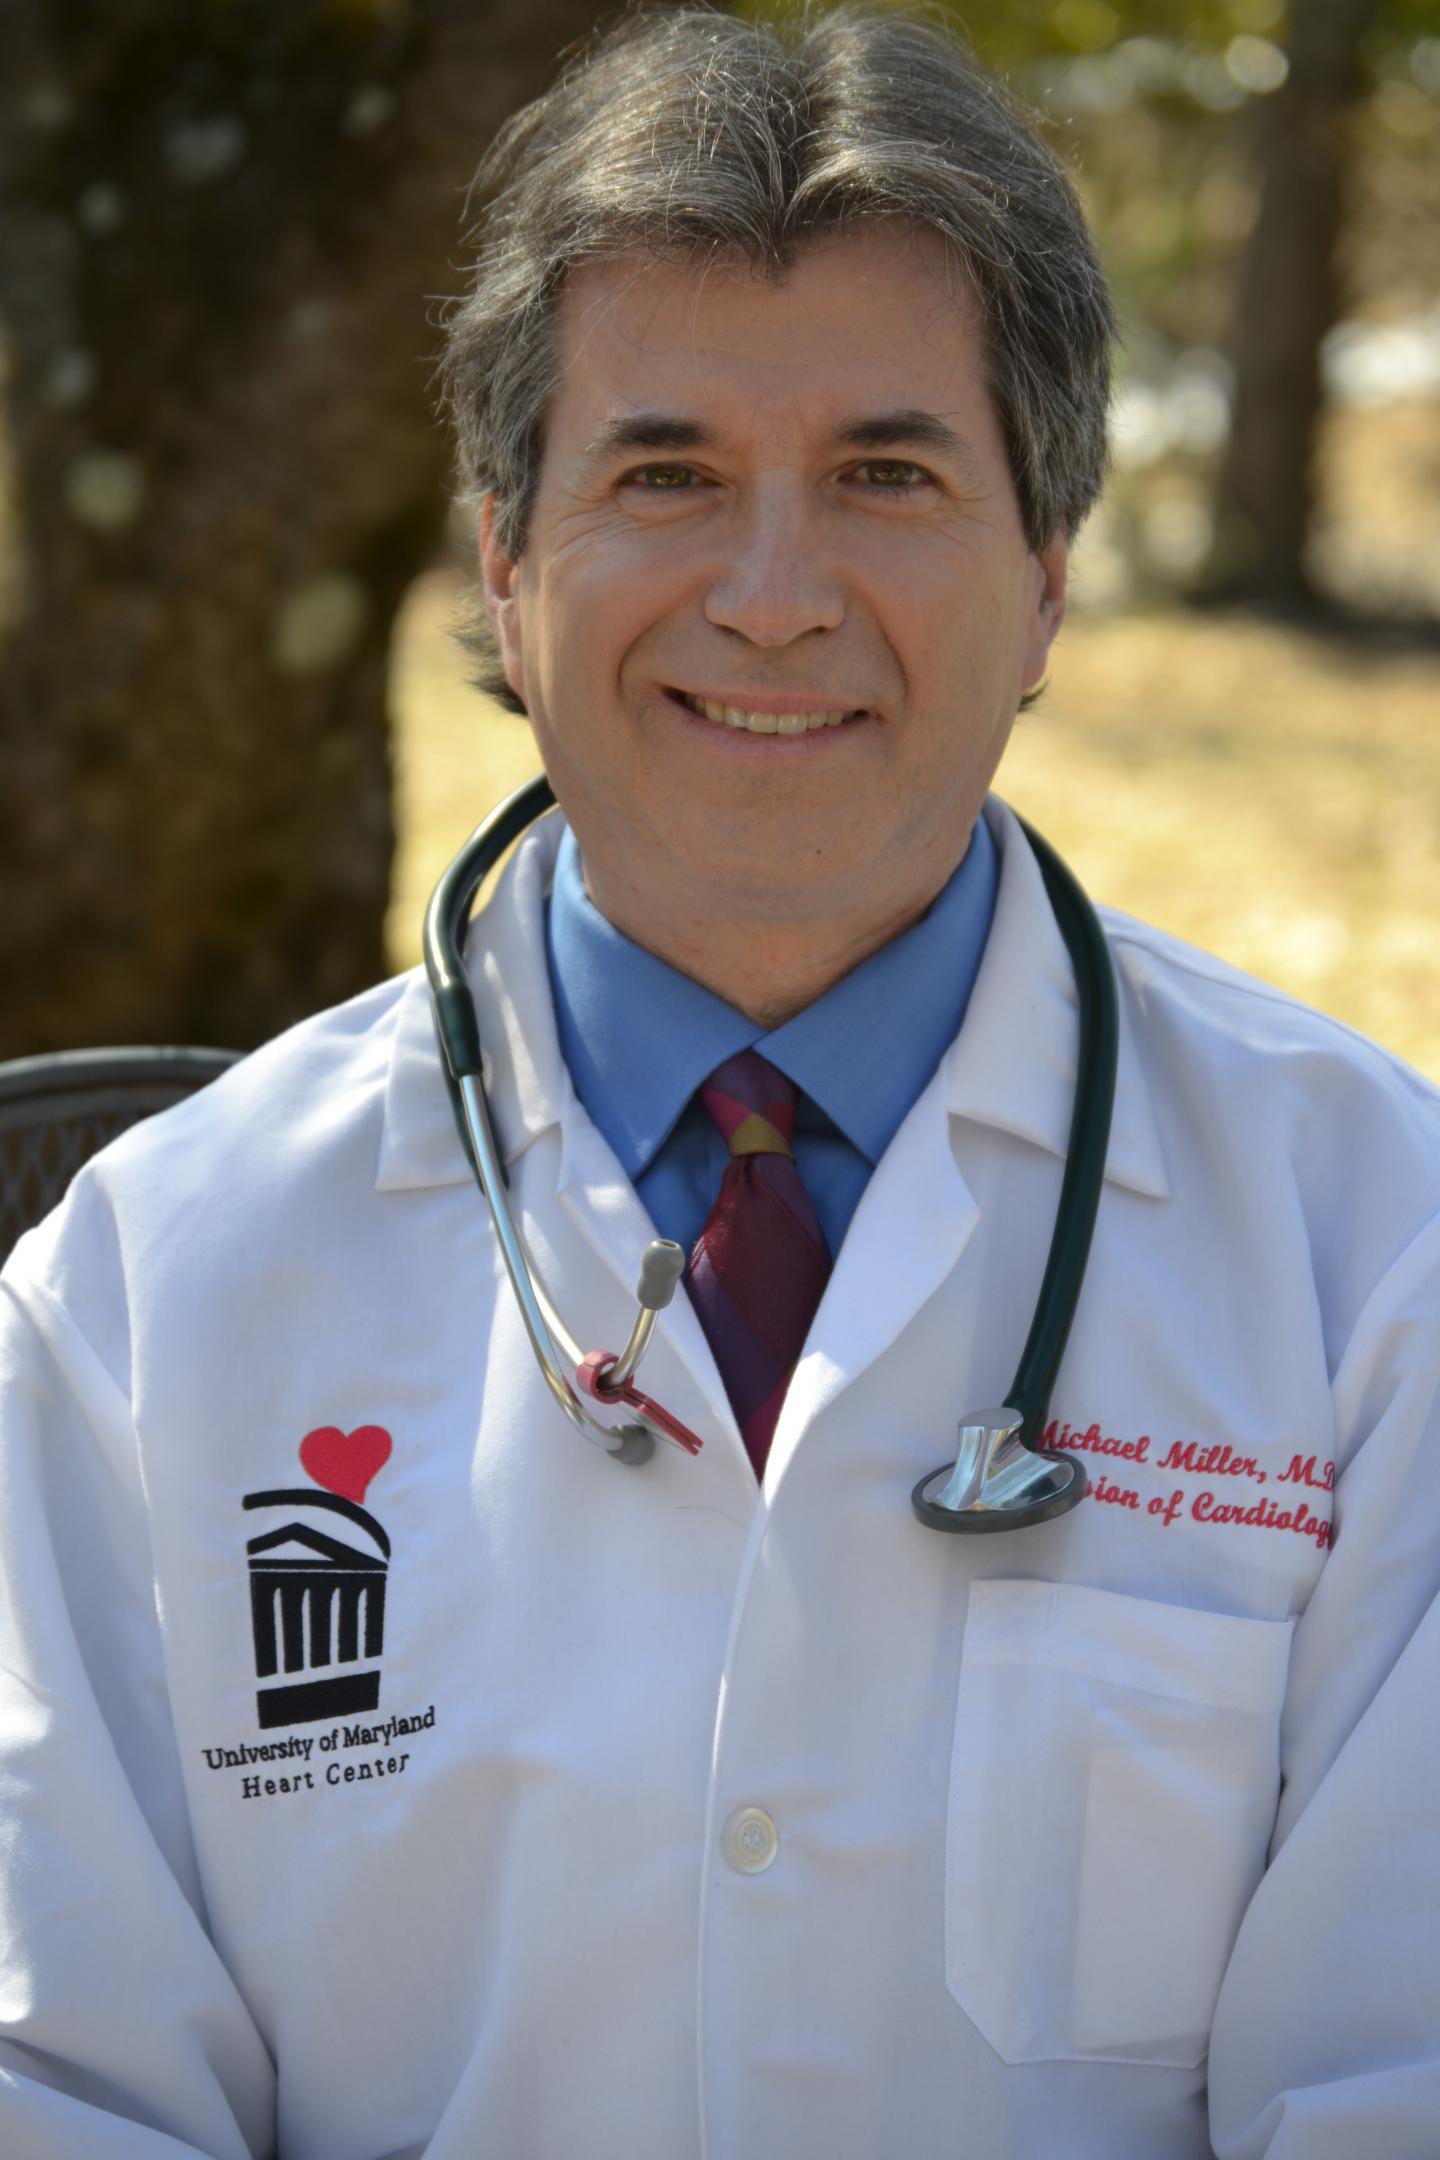 Michael Miller, M.D., University of Maryland Medical Center